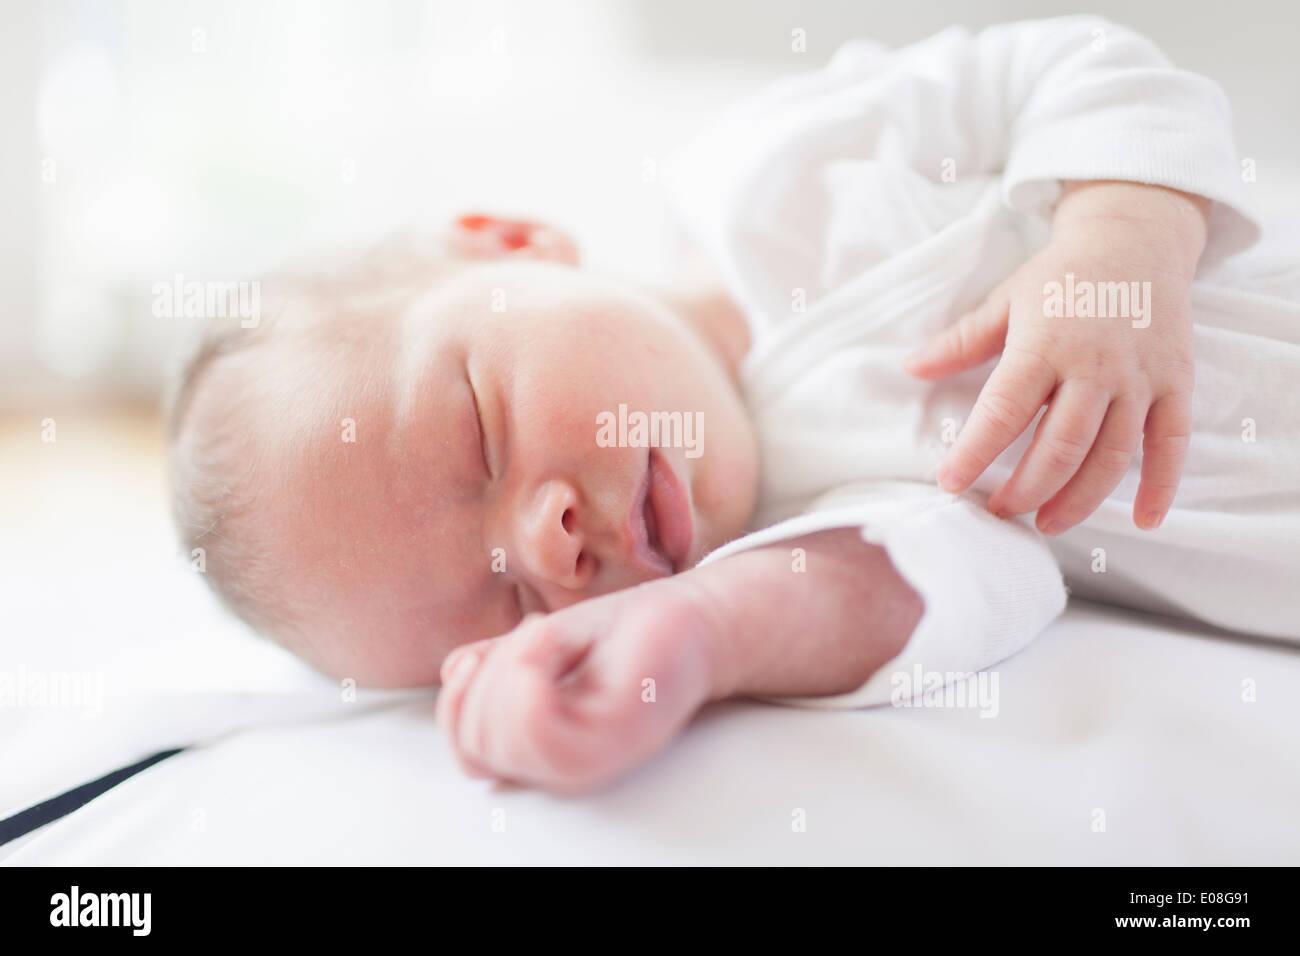 Newborn baby sleeping peacefully - Stock Image